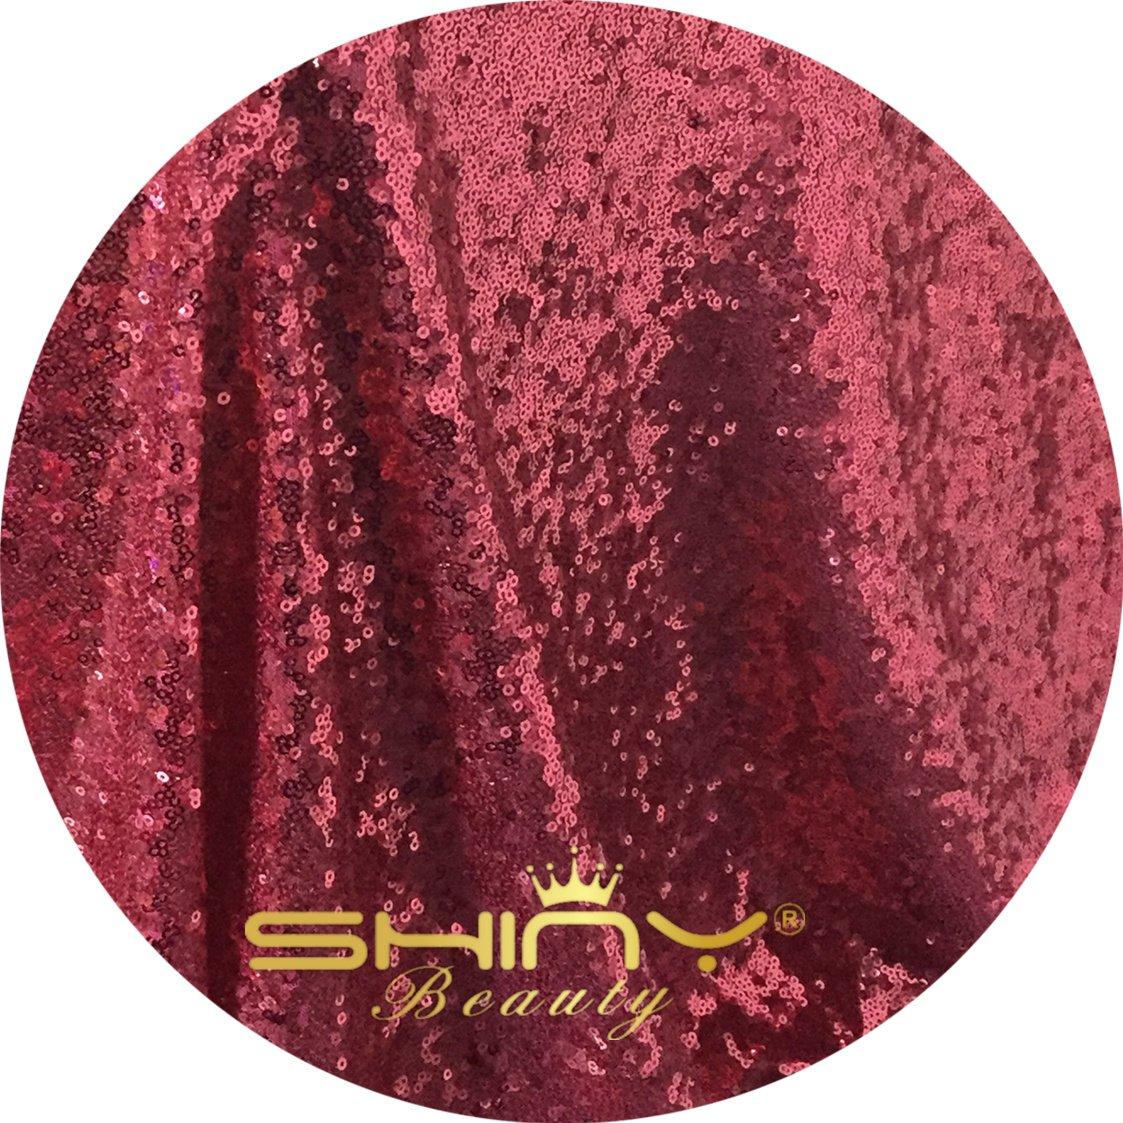 ShinyBeauty Aisle Runner Carpet-4FTX40FT-Fuchsia,Personalized Rustic Sequin Fabric Carpert Runner,Sparkle Aisle Runner For Wedding Outdoor by ShinyBeauty